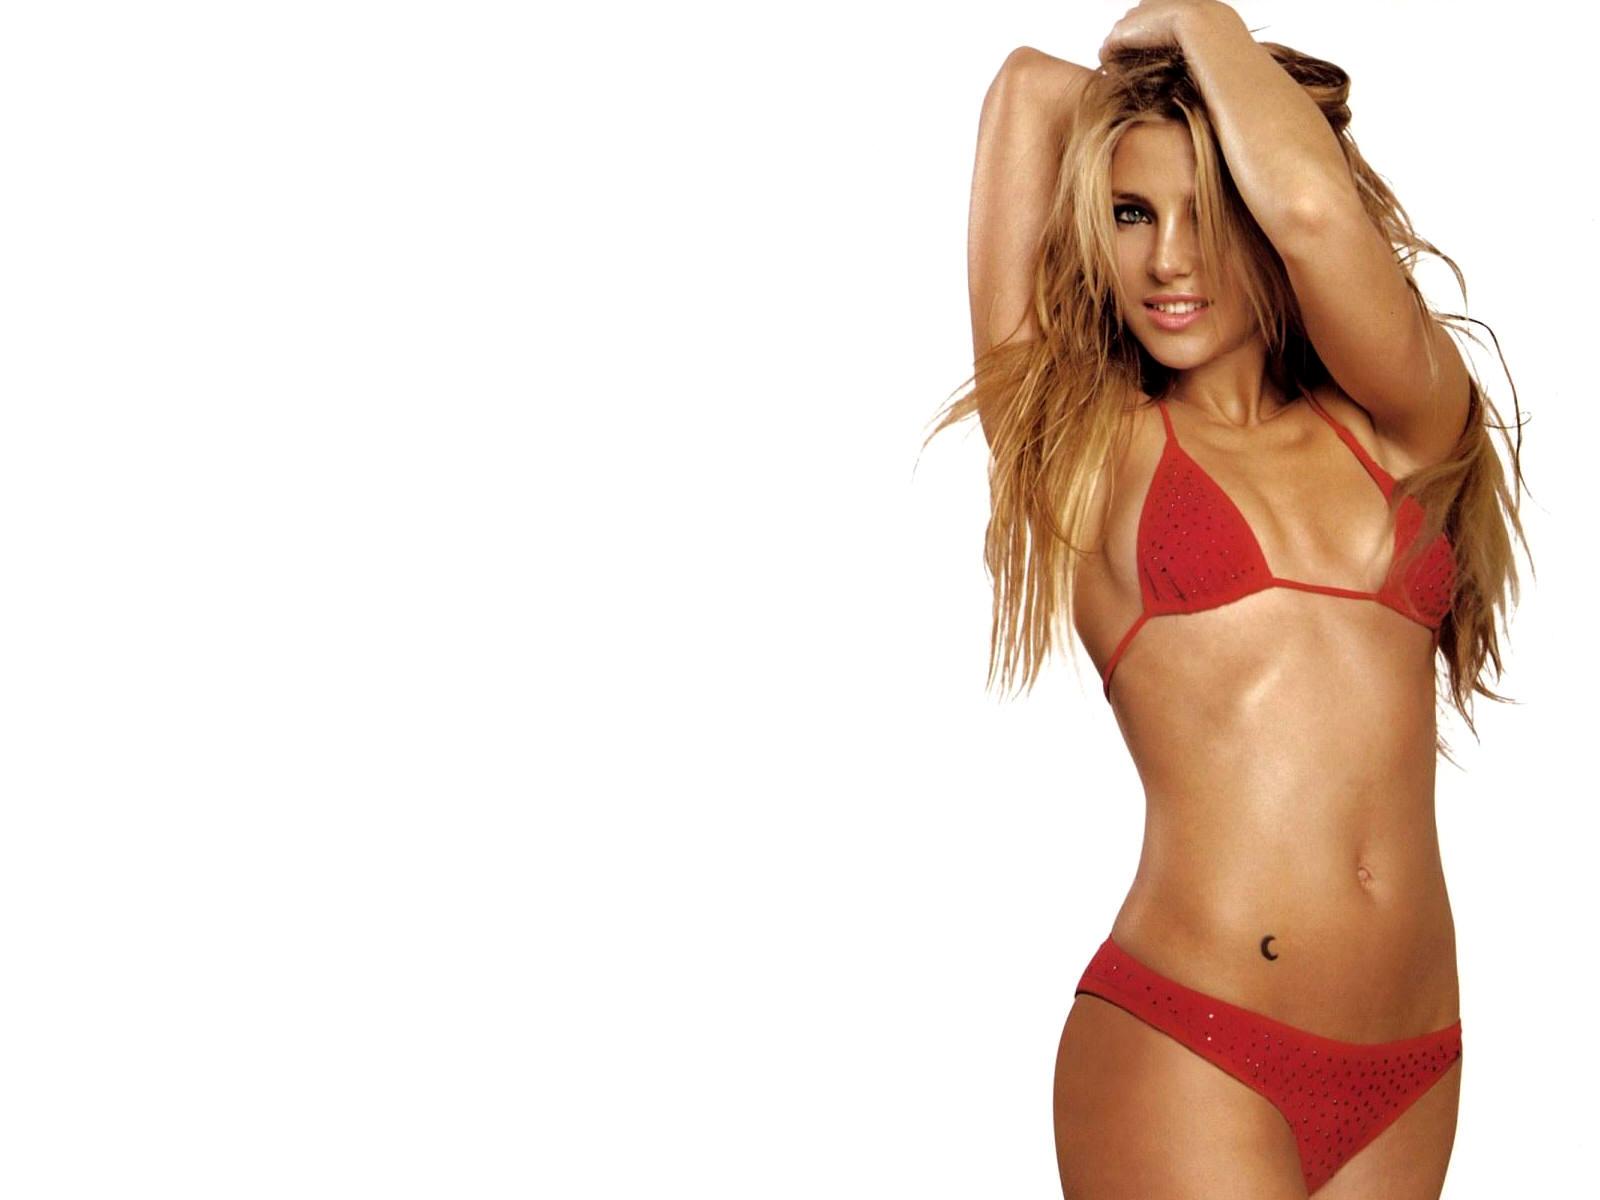 sexy celebs bikini wallpaper 9 bikini screensaver